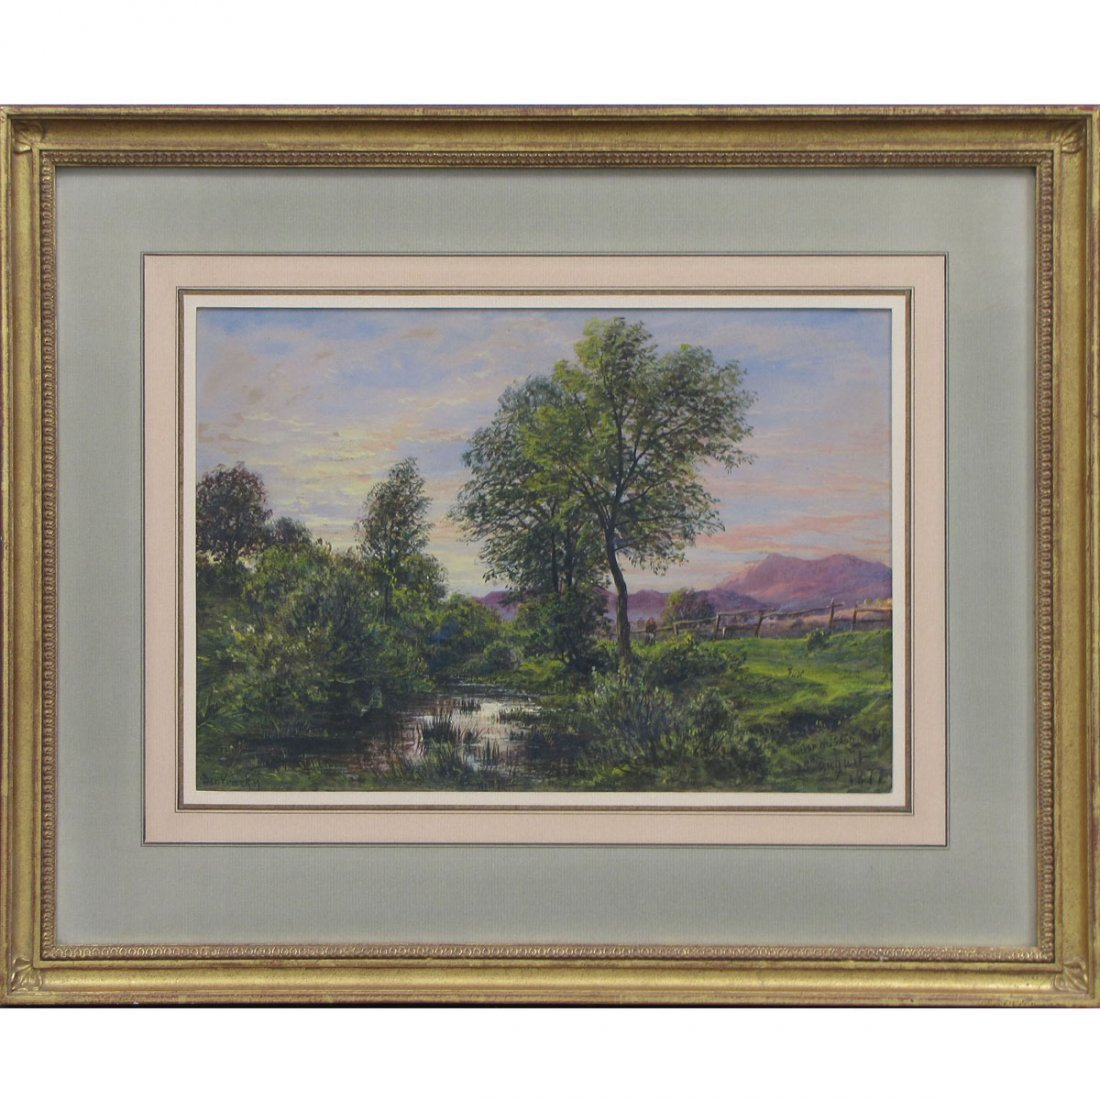 WALLER HUGH PATON RSA, RSW (BRITISH 1828-1895)